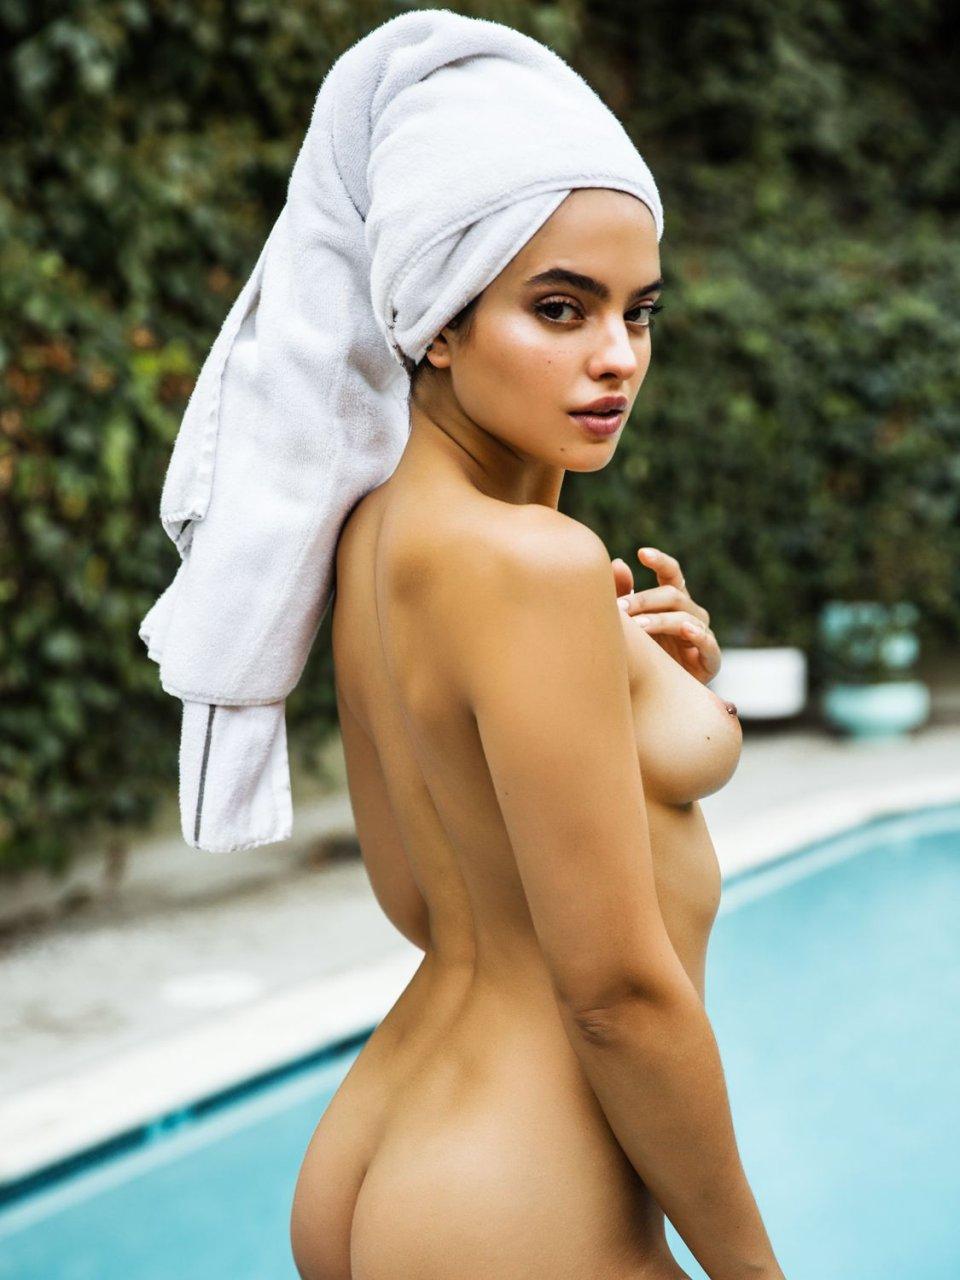 nina lopez nude